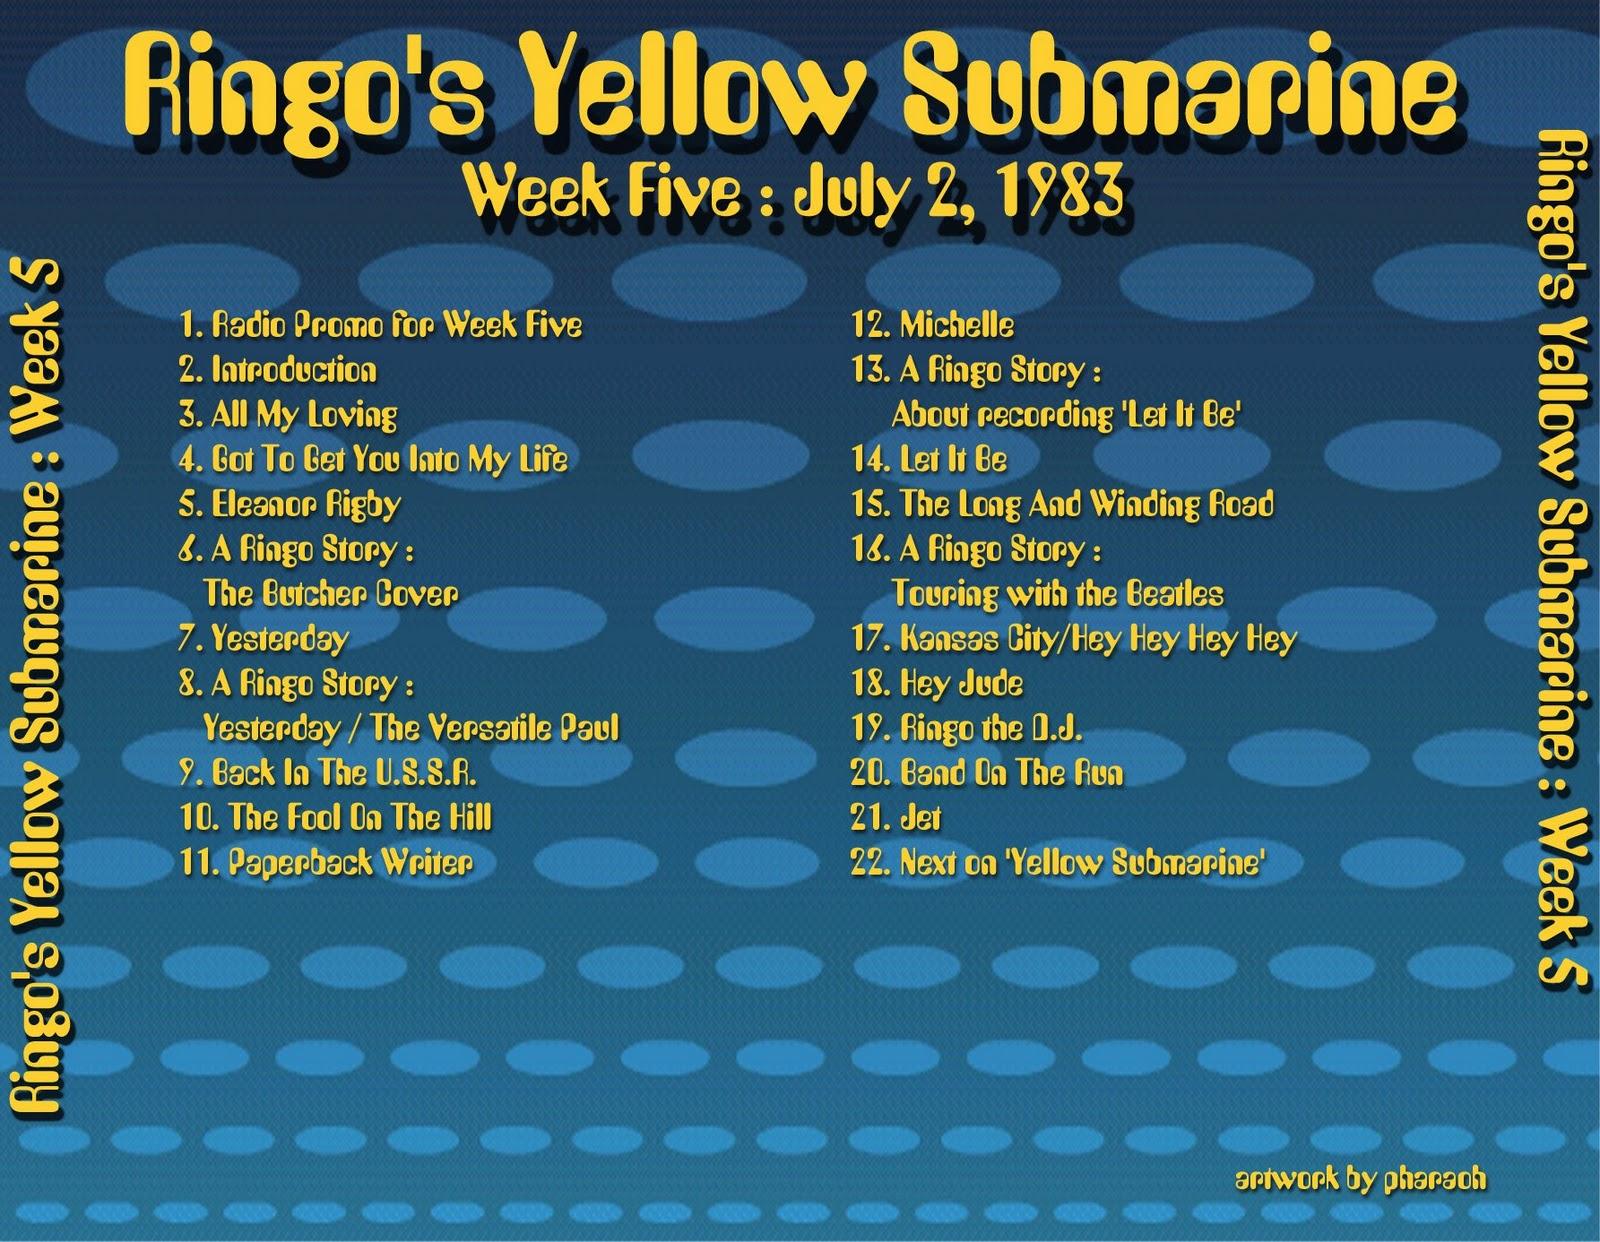 Beatles Radio Waves: 1983 07 02 Ringo's Yellow Submarine 05 #B99A12 1600 1242